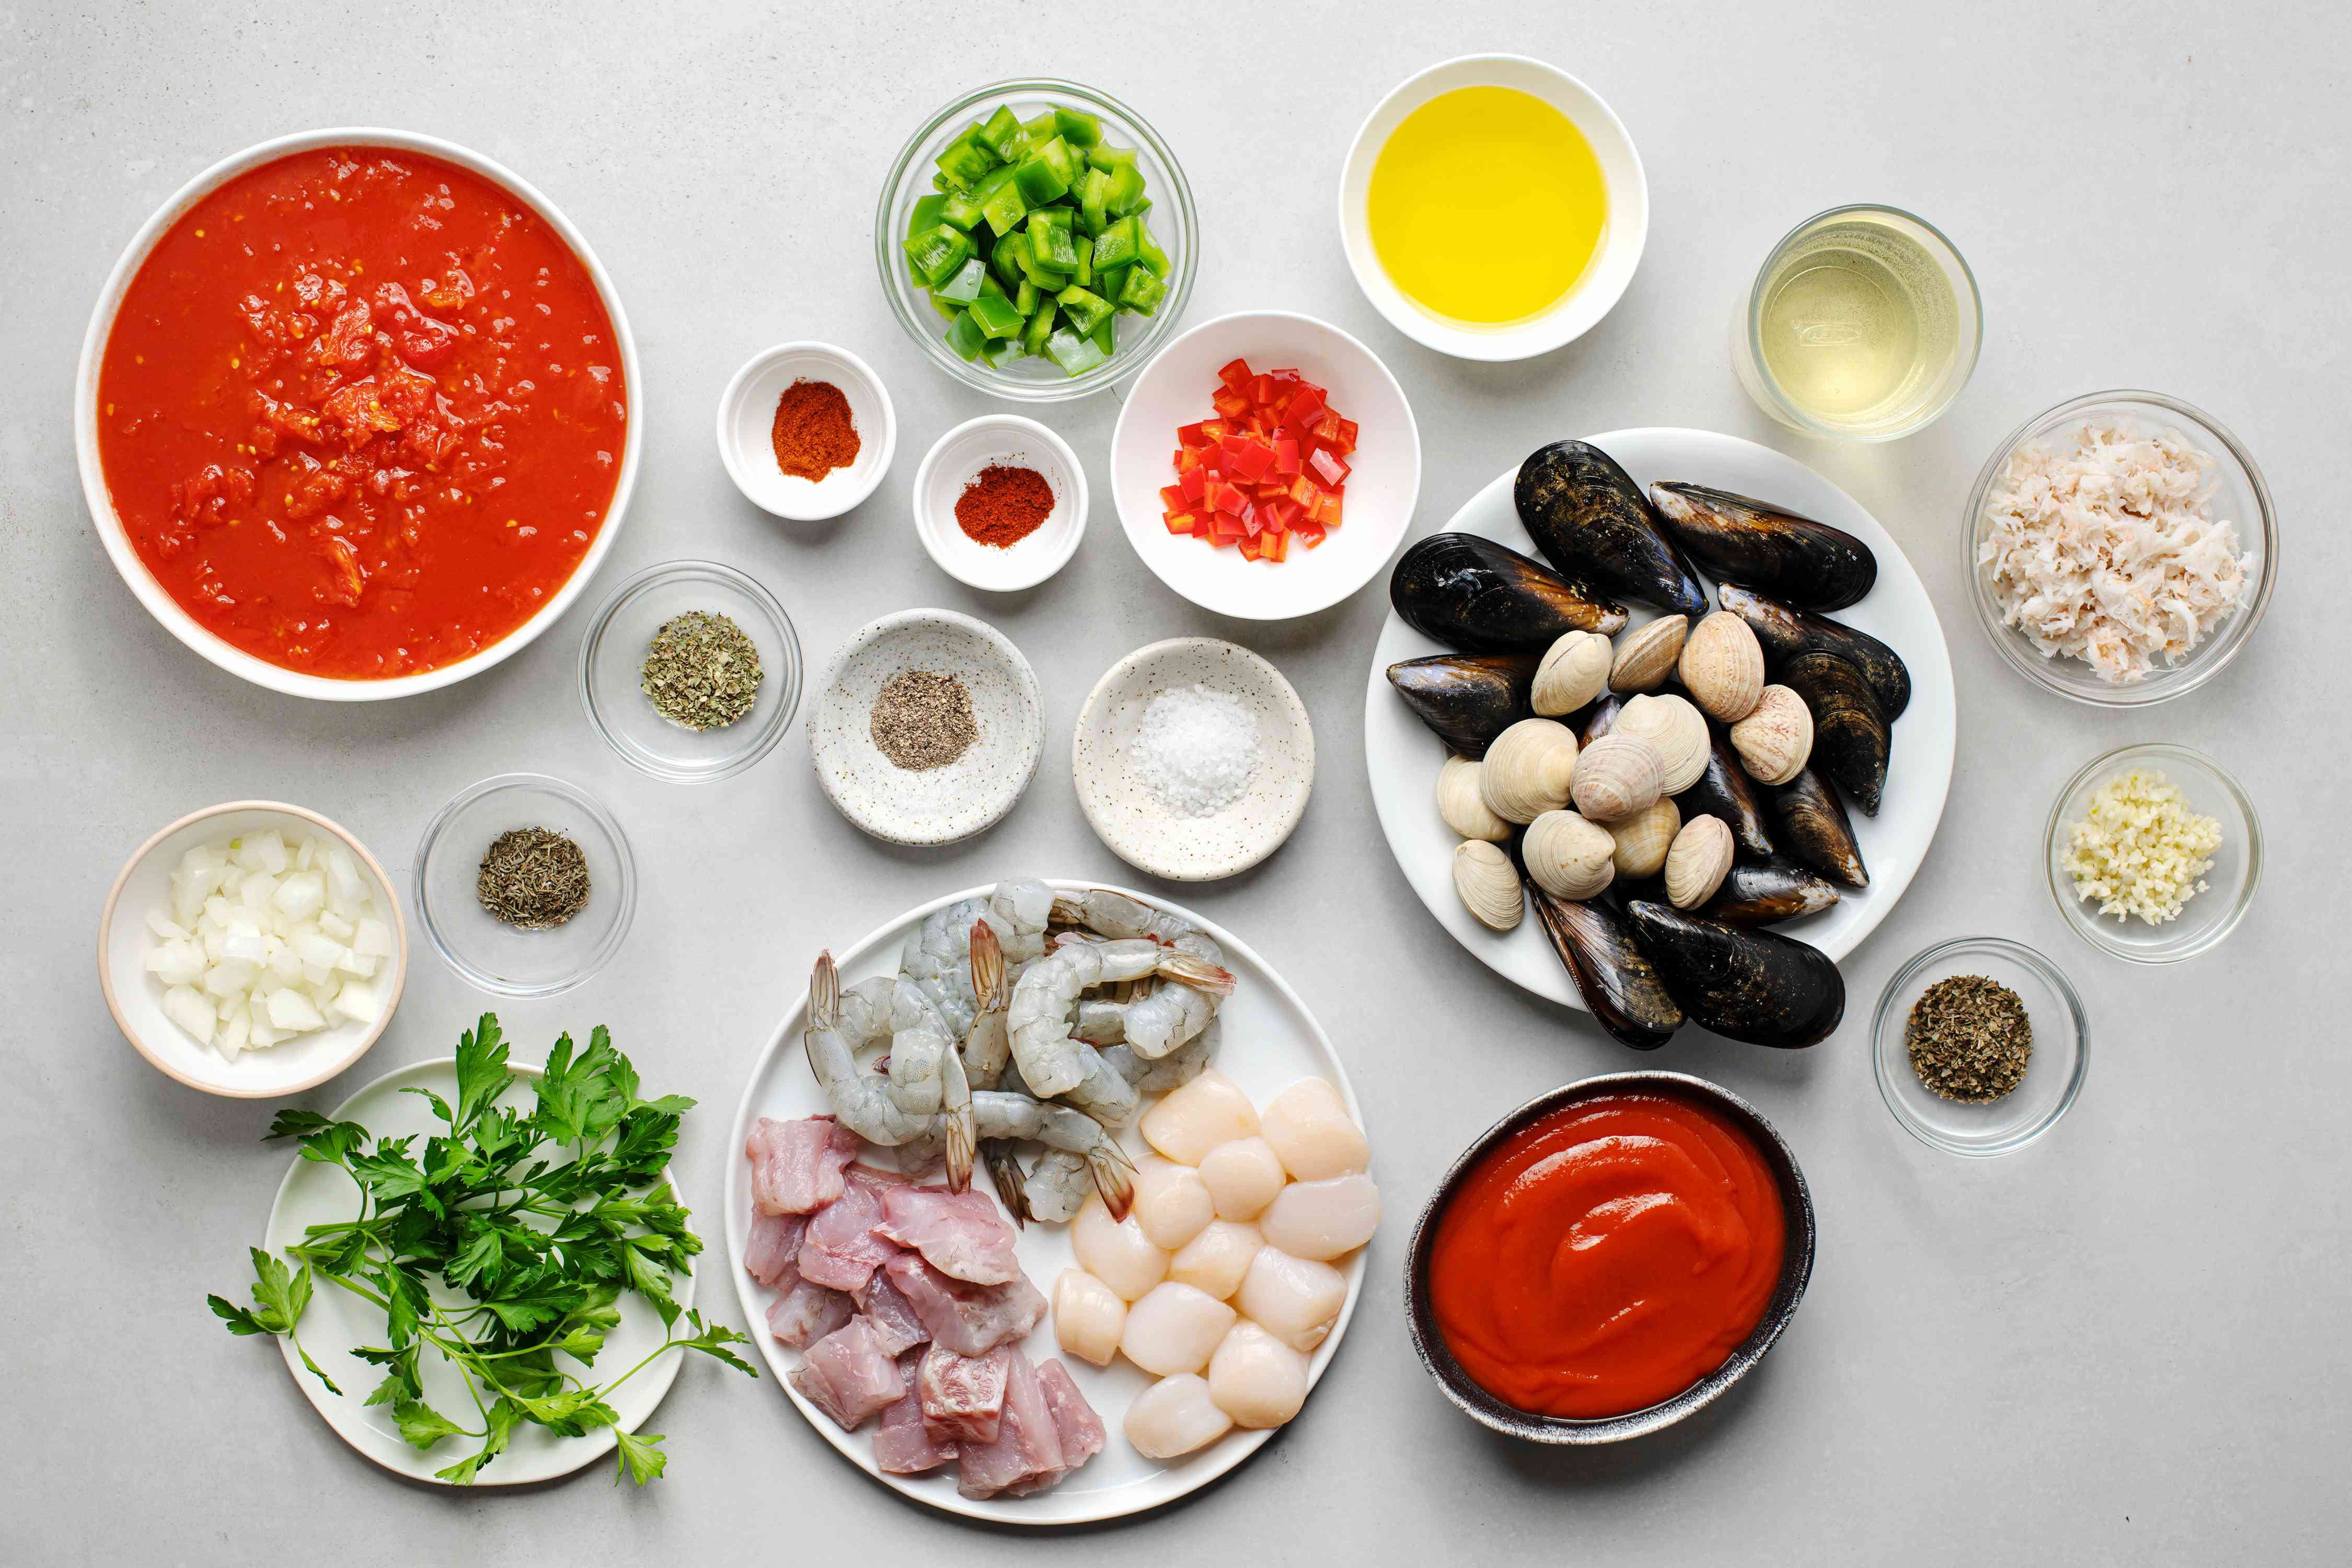 Crock Pot Fisherman's Stew (Cioppino) ingredients